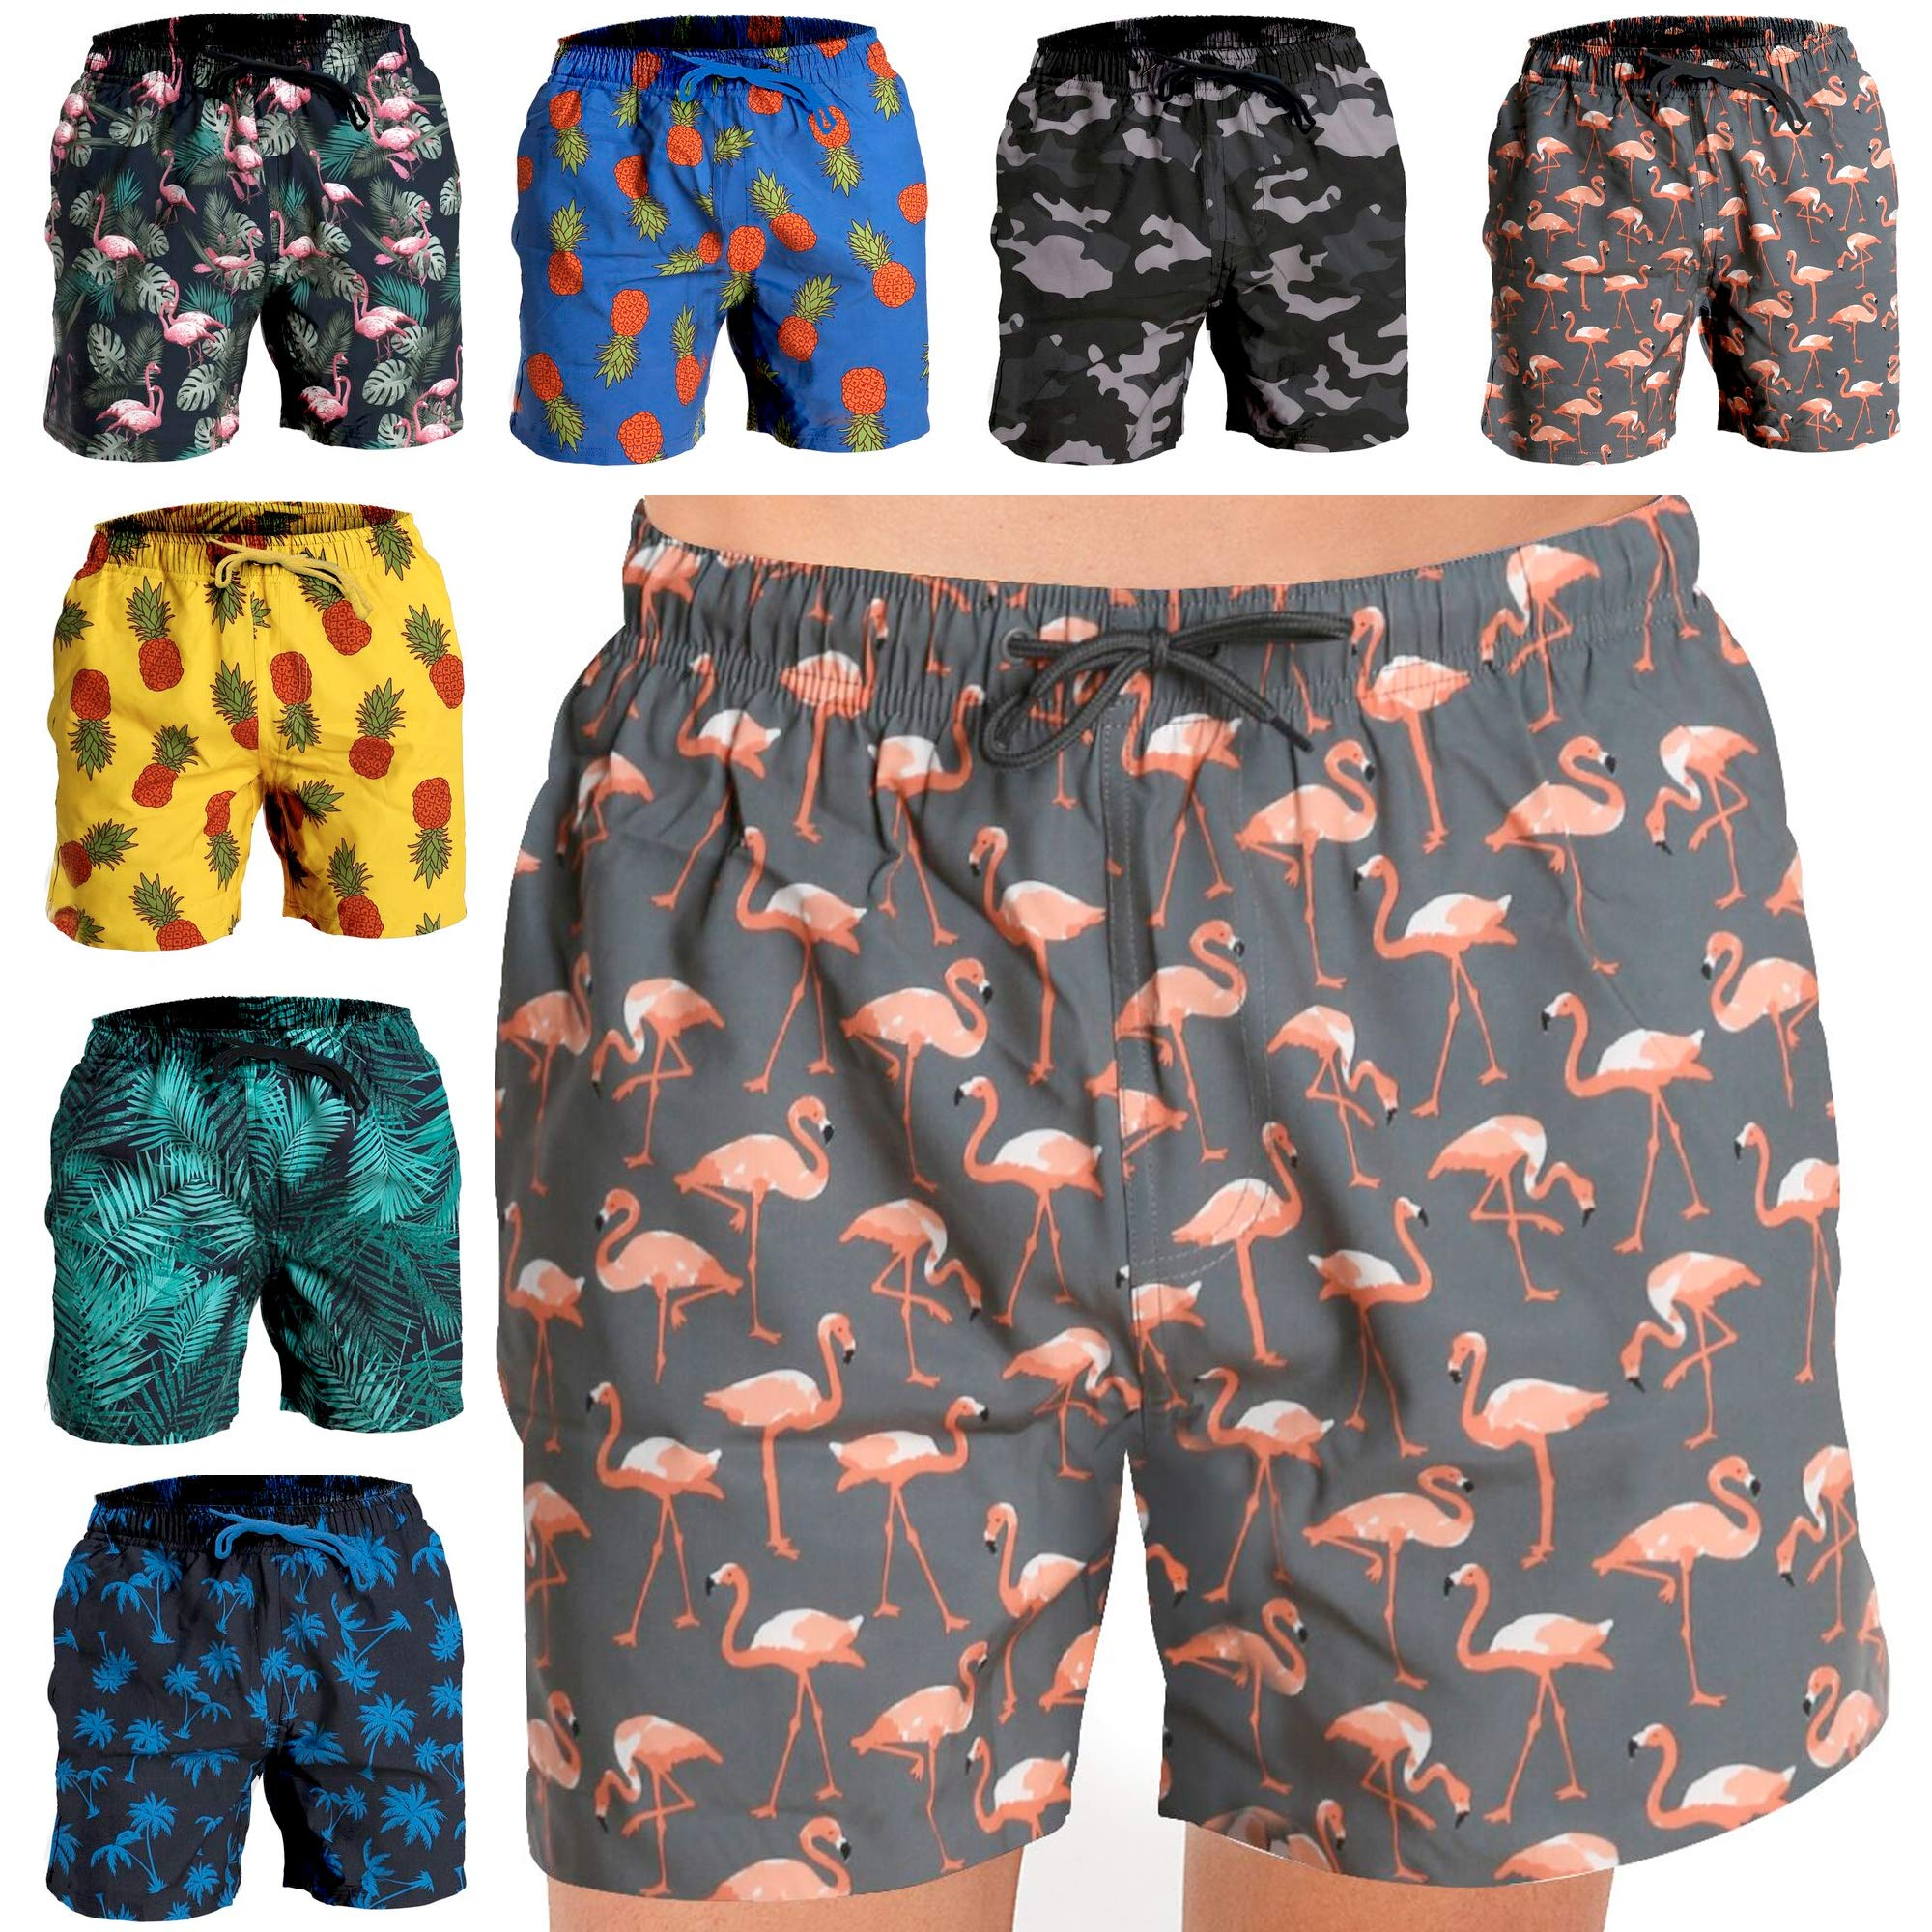 Fort Isle Mens Stretch Swim Trunks - XXL - Gray Flamingos - Quick Dry 4-Way Stretch - Bathing Suit by Fort Isle